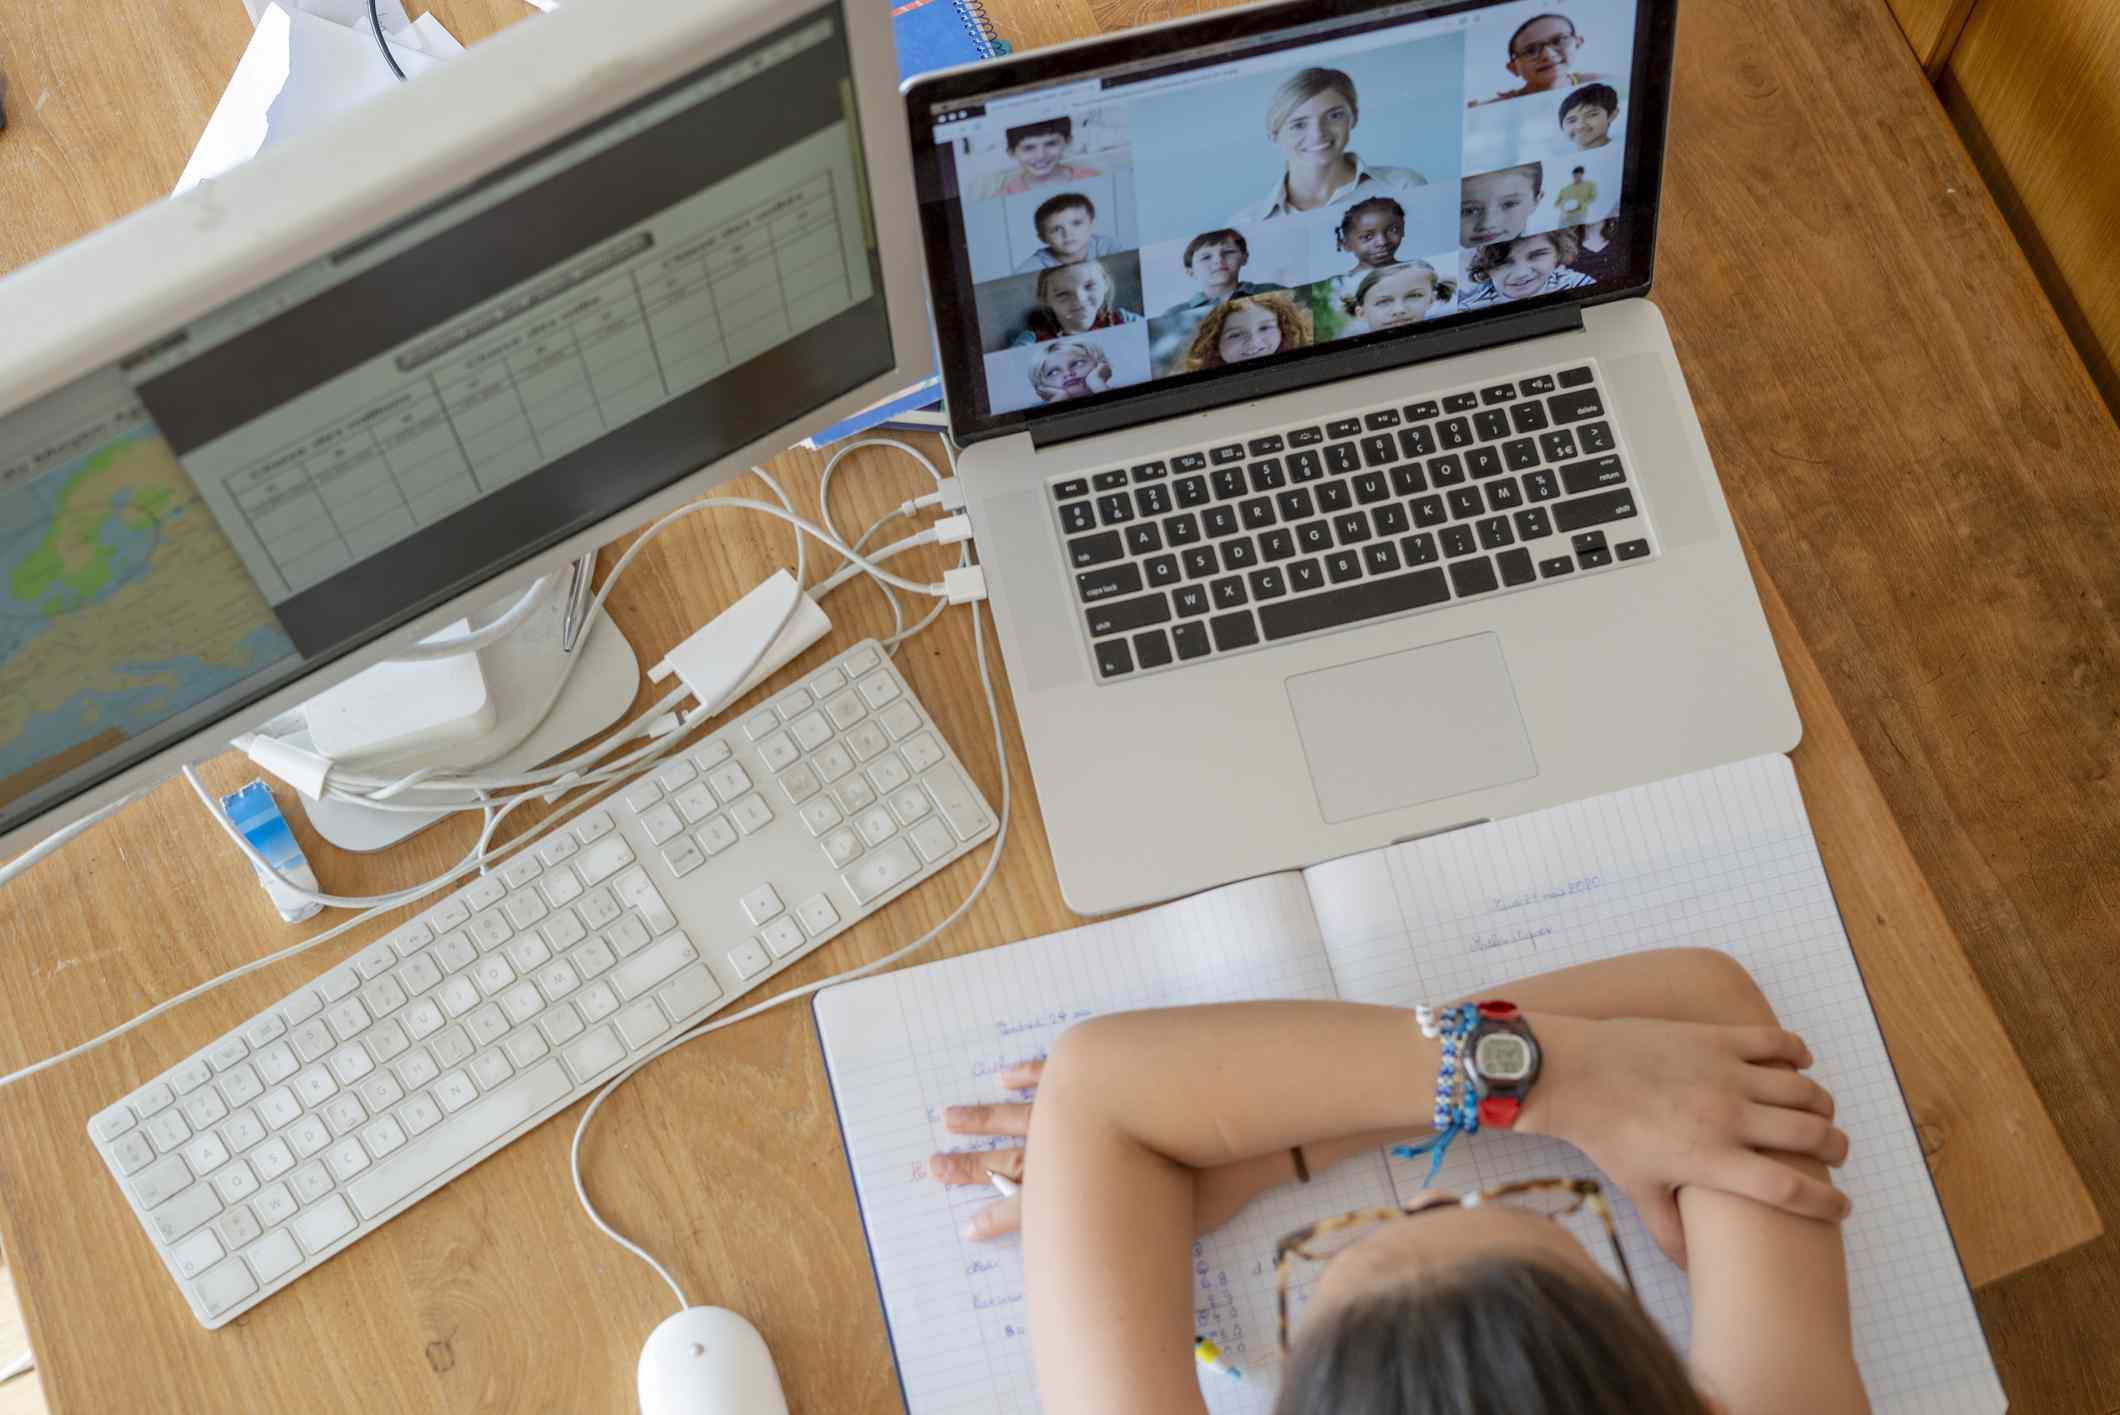 Overhead view of girl attending online school classes from home during coronavirus lockdown